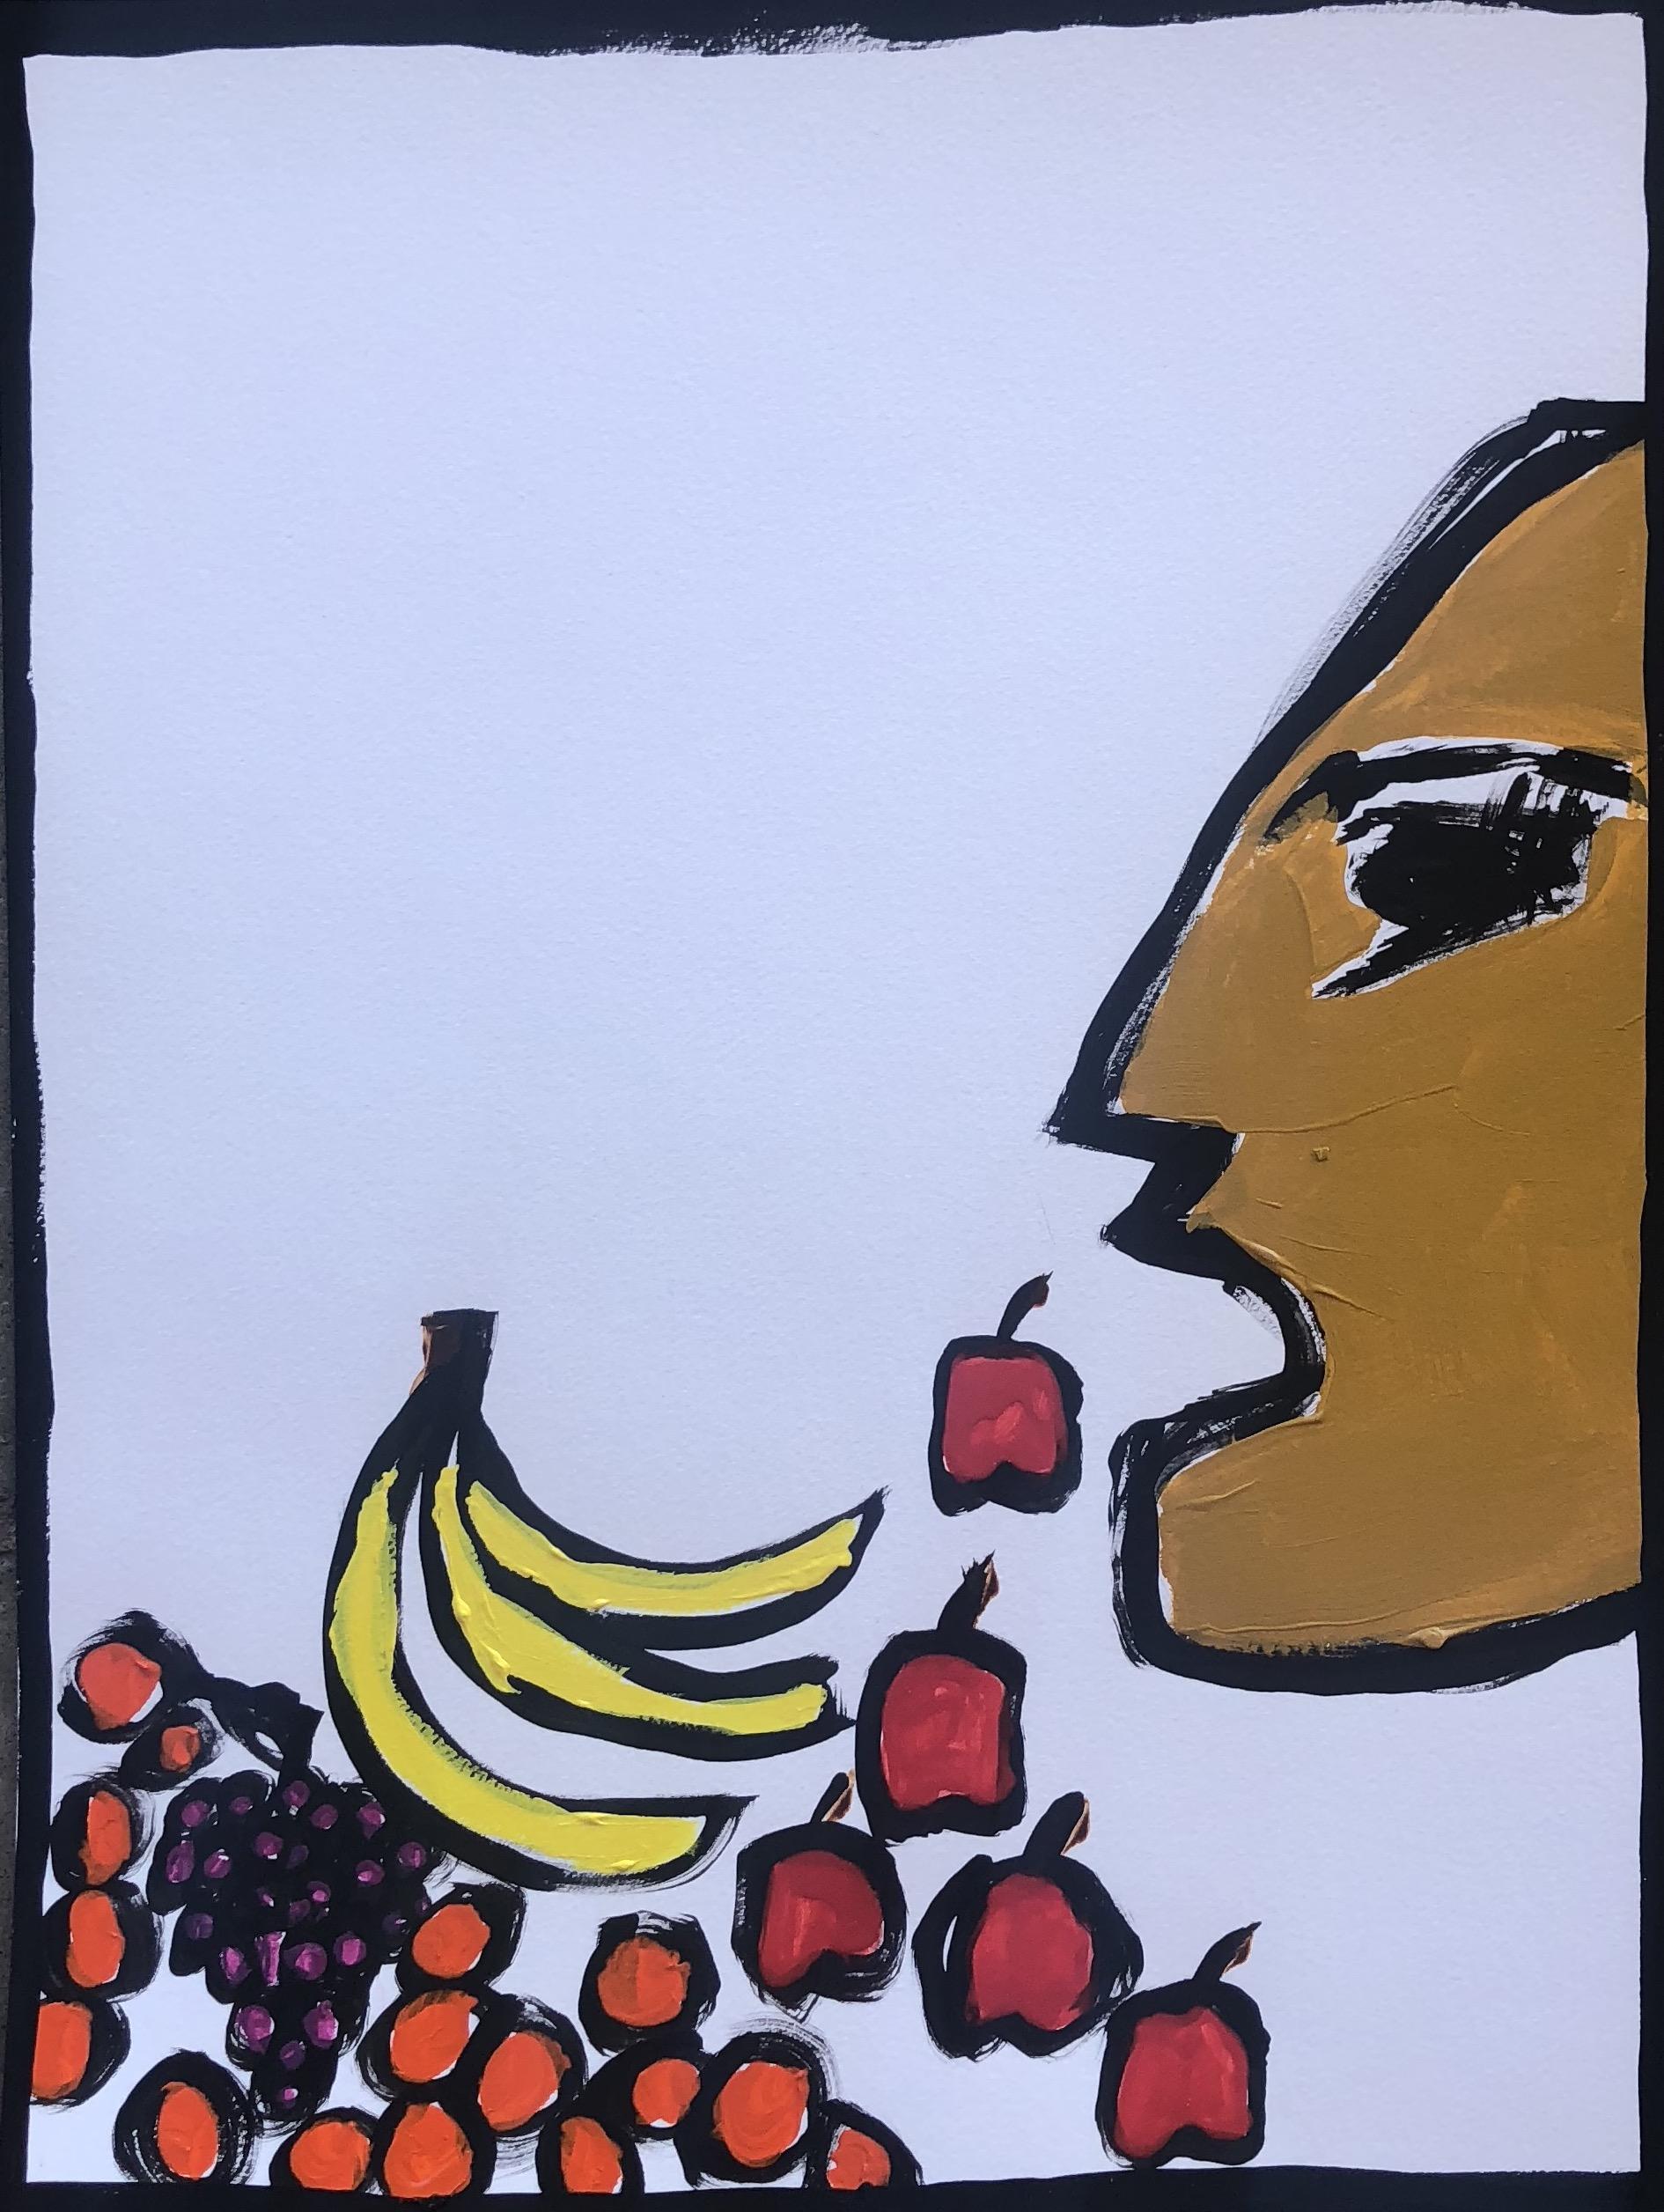 FruitoftheBallotJPG.JPG